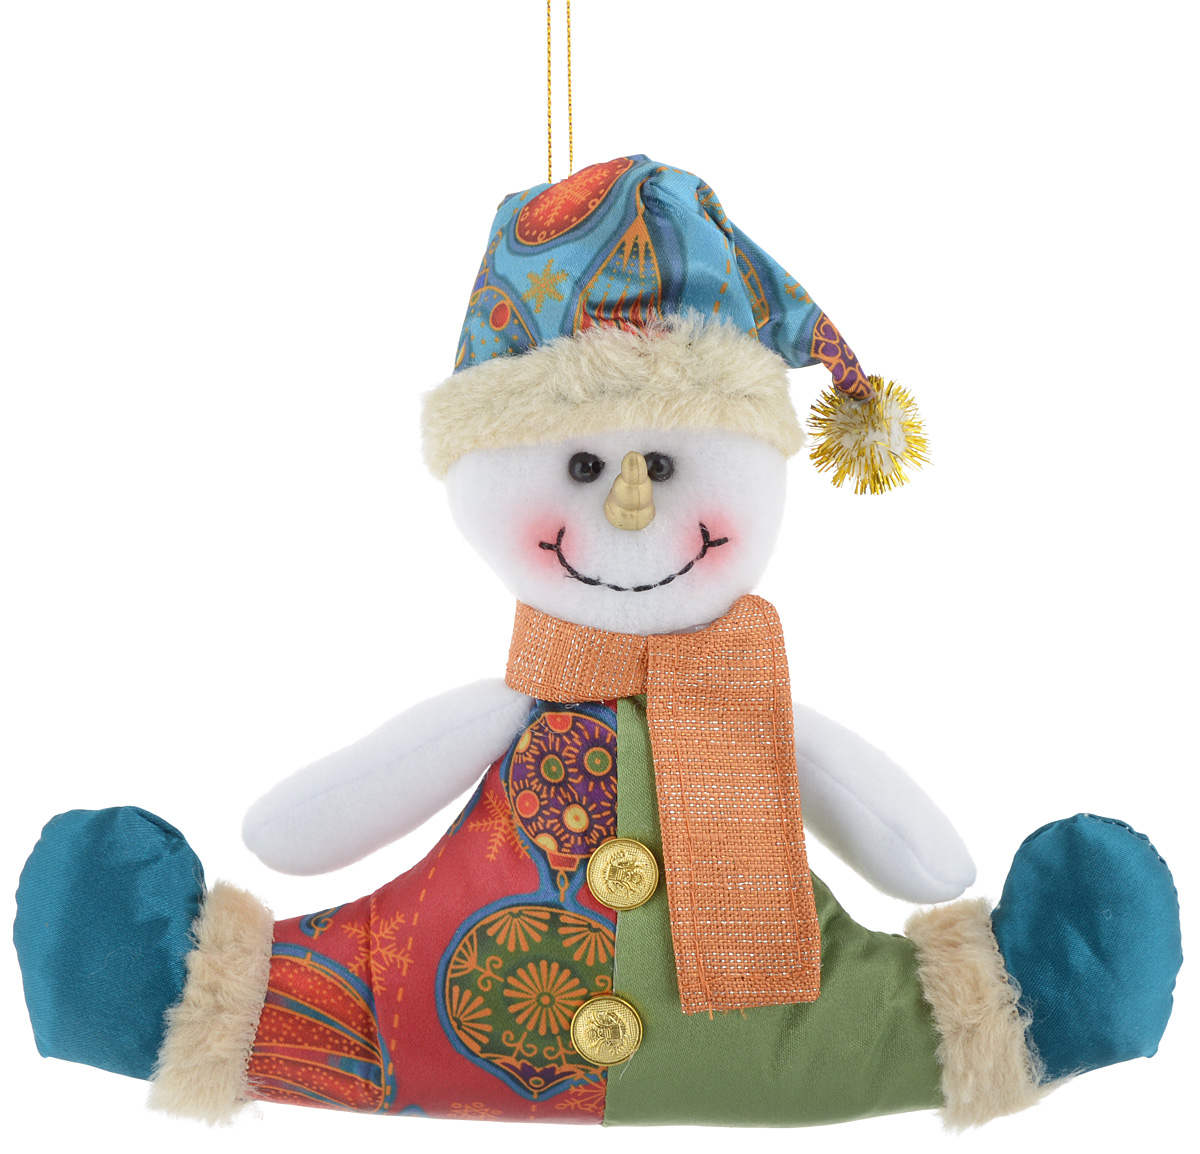 Украшение новогоднее подвесное Win Max Снеговик, 17 х 20,5 см набор сундучков win max 25 х 17 х 13 см 2 шт 83605